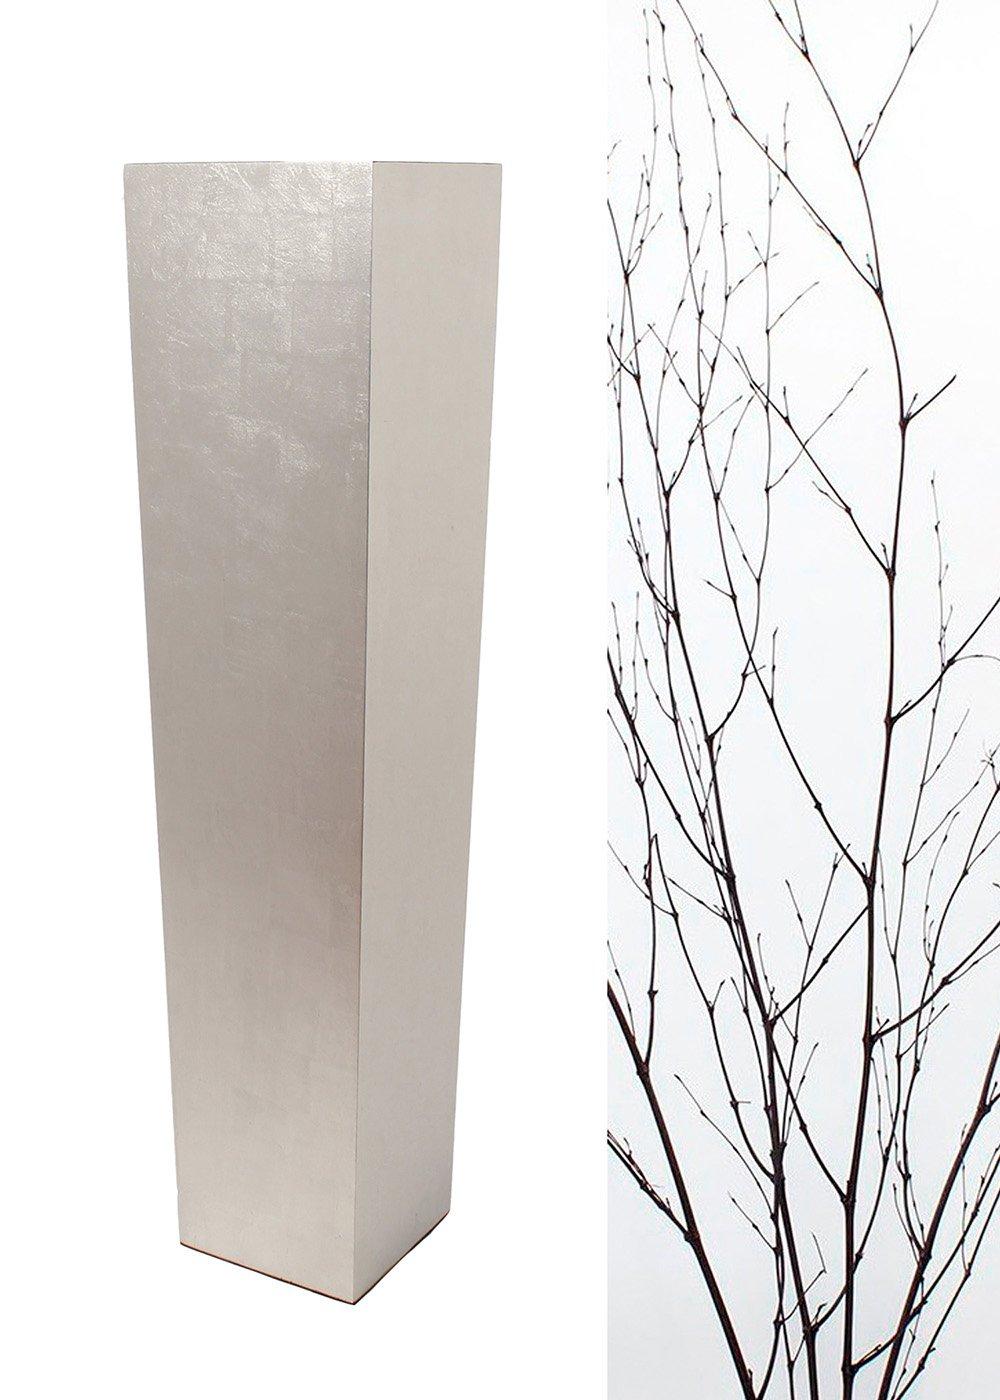 Green Floral Crafts 36'' Tapered Tall Floor Vase - All Silverleaf Vase& DIY Branches Kit